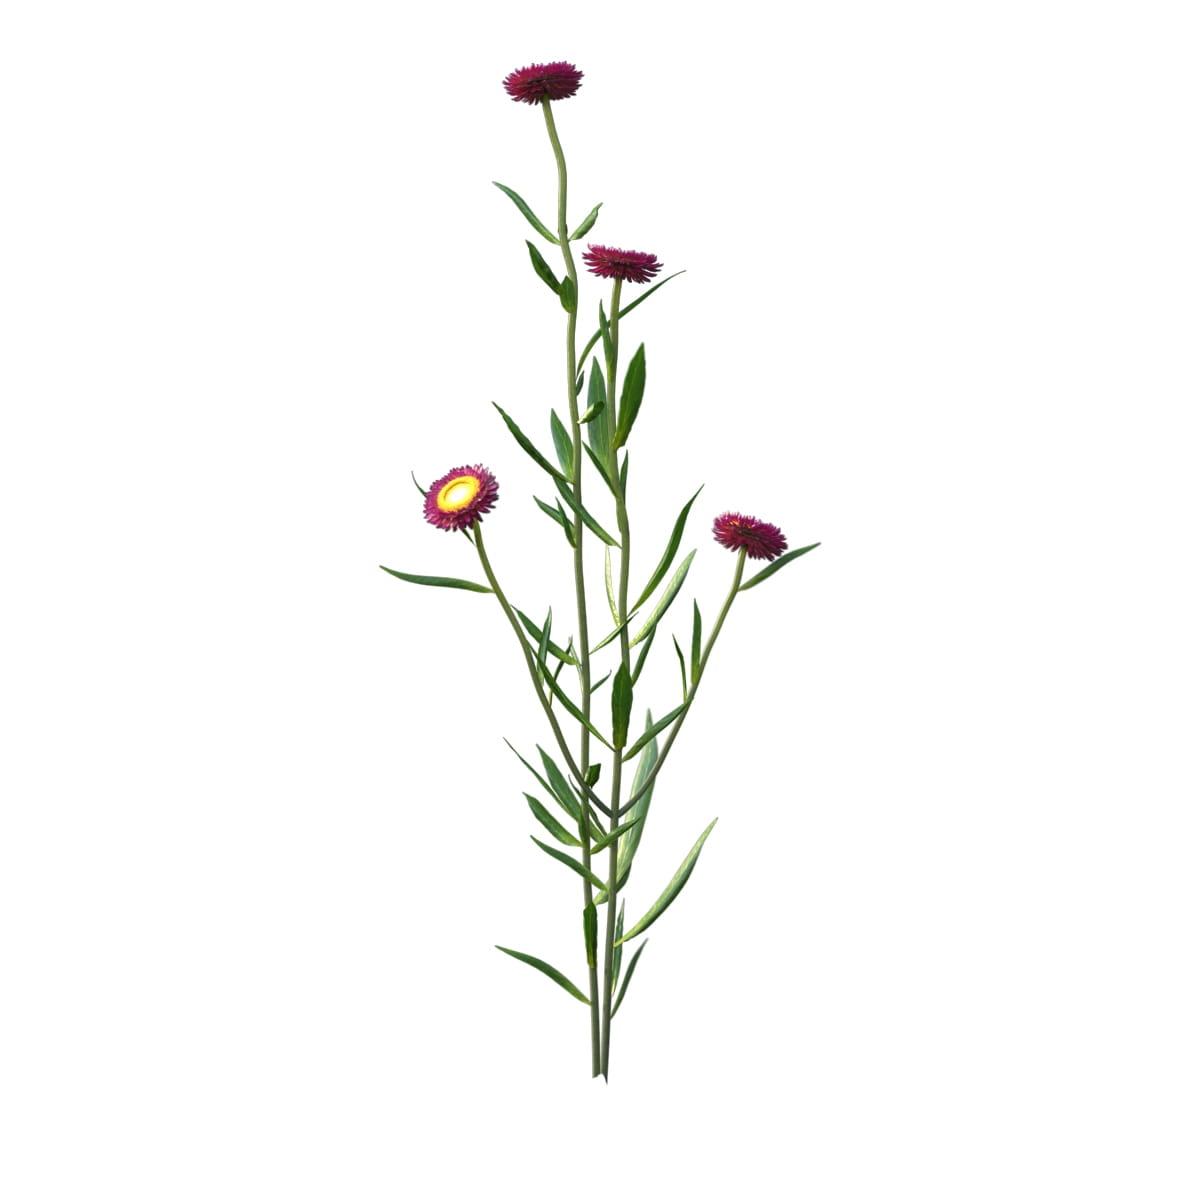 Helichrysum bracteatum 24 AM214 Archmodels